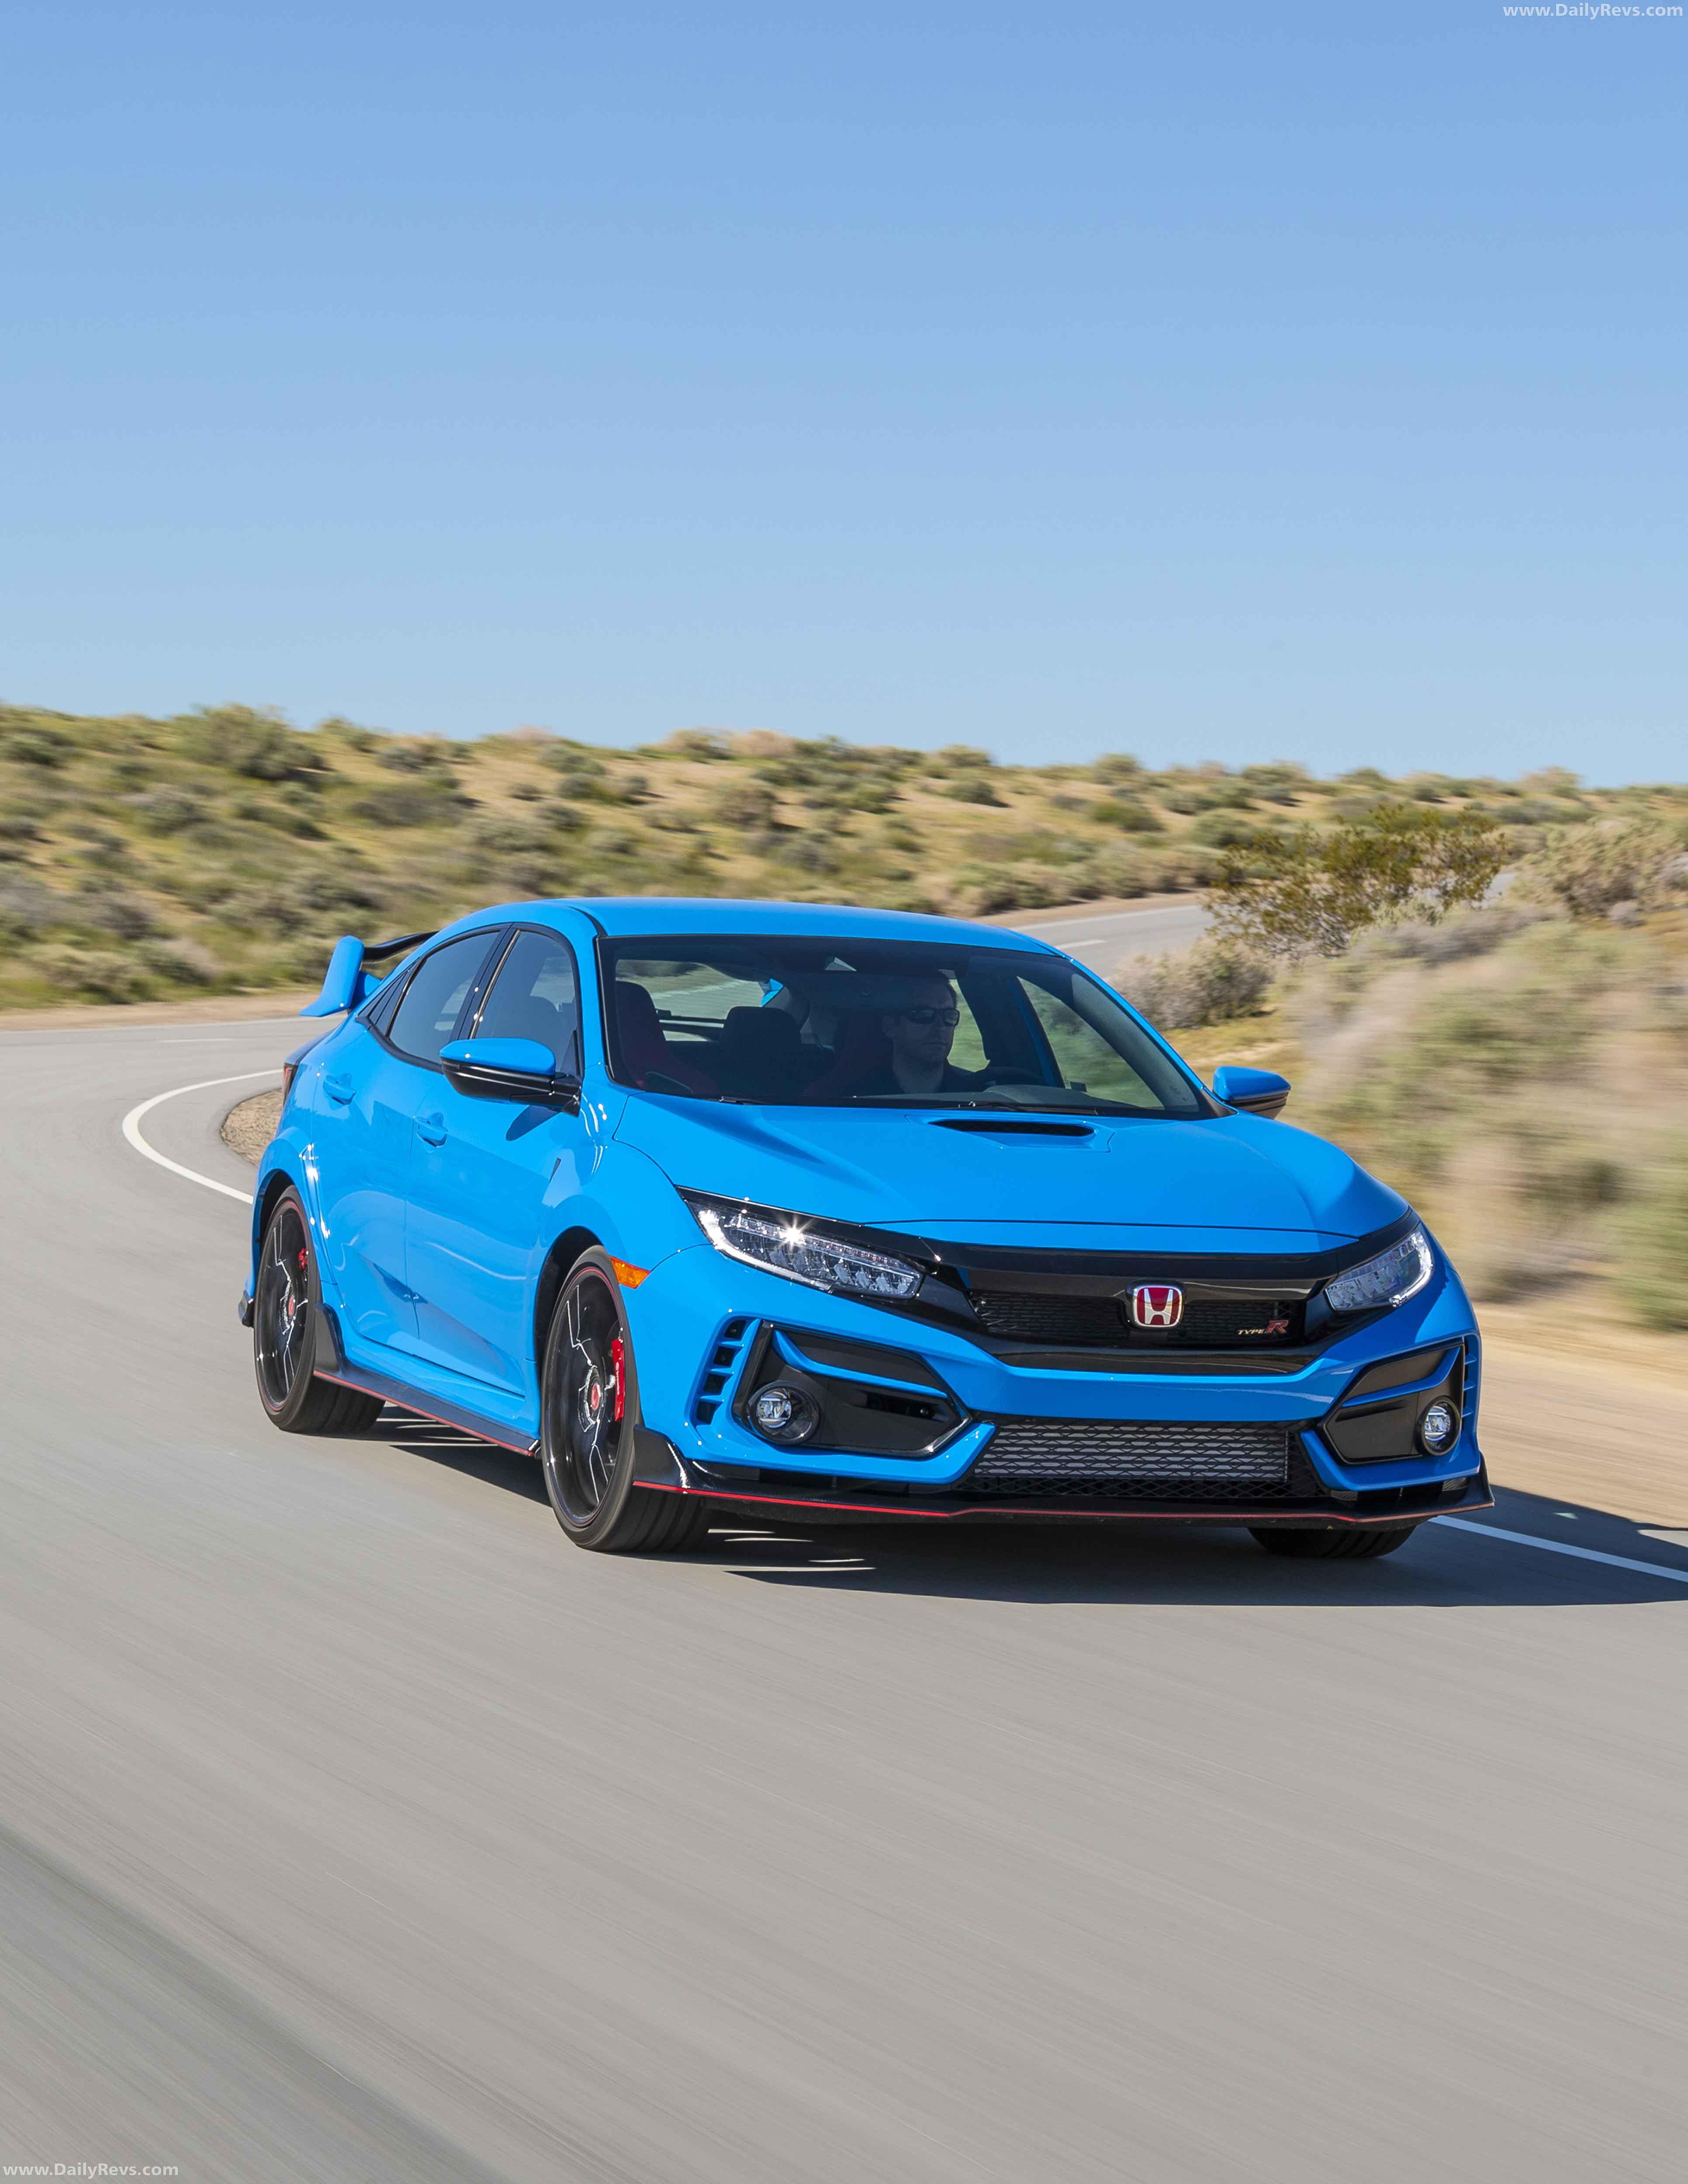 2020 Honda Civic Type R - HD Pictures, Videos, Specs ...